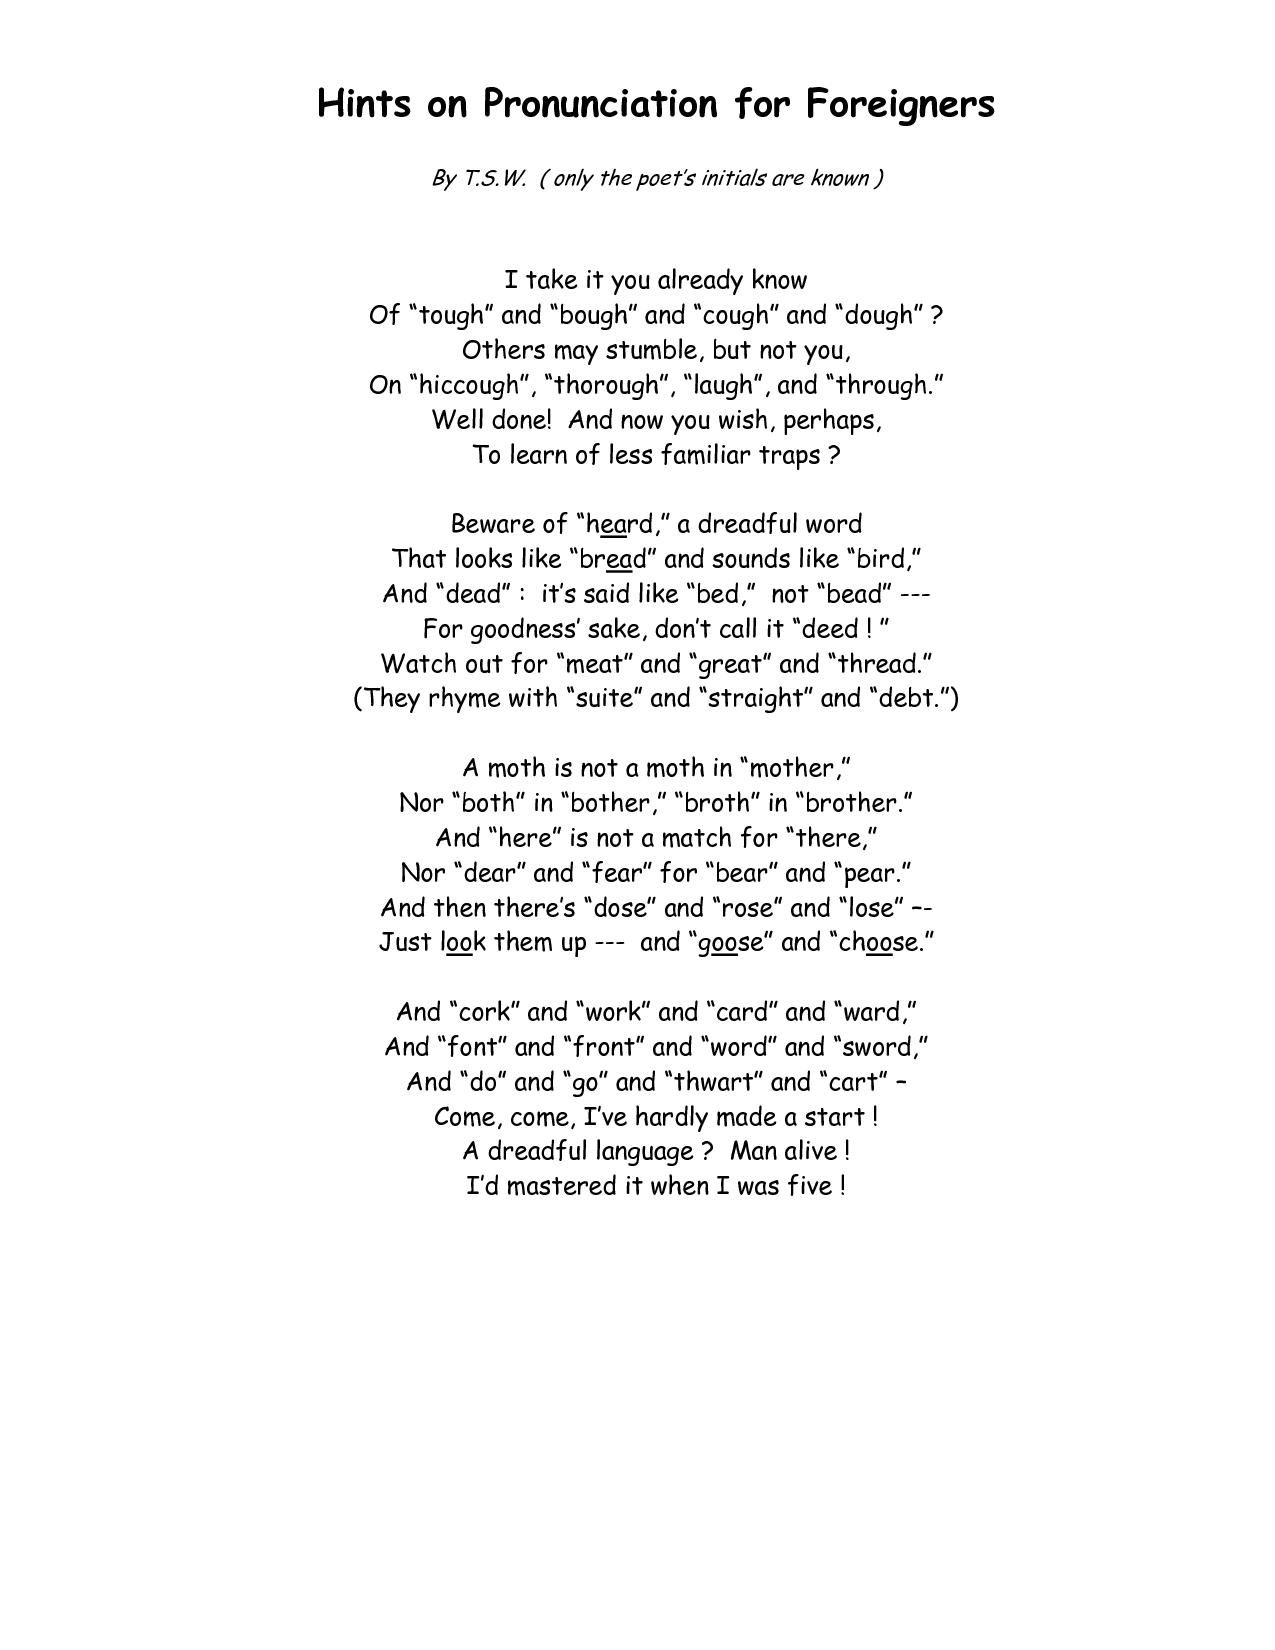 English pronunciation 101 poem